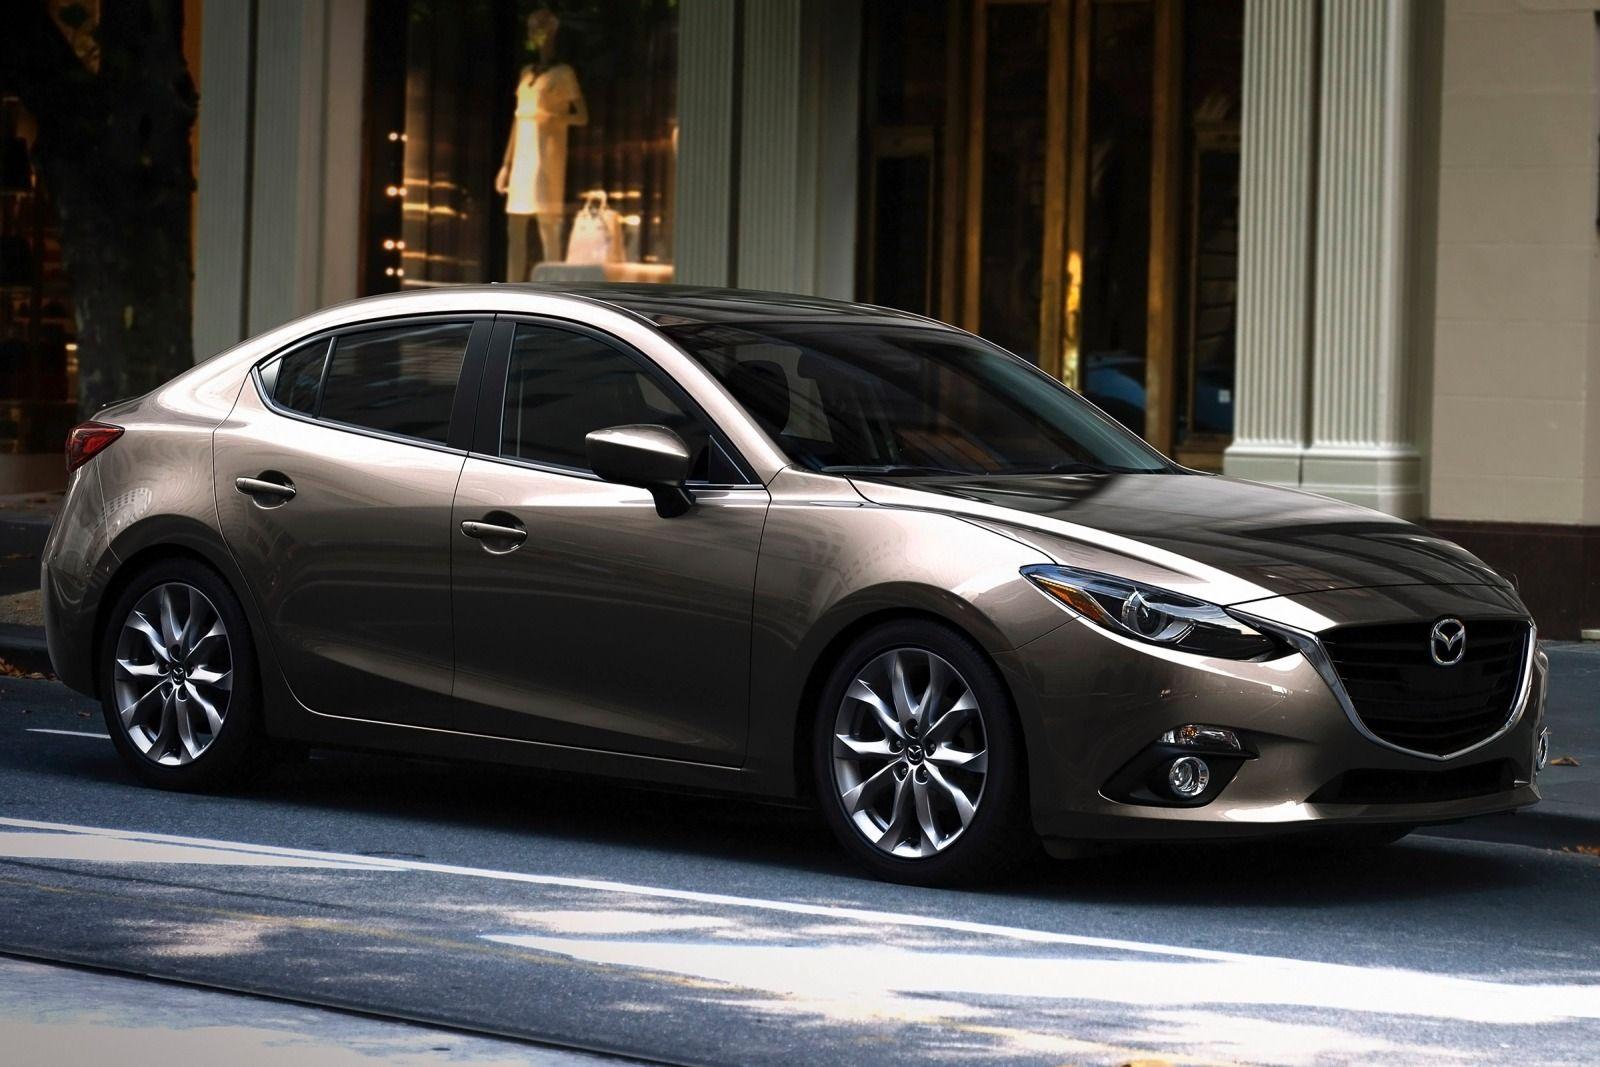 Kelebihan Kekurangan Mazda 3 Hatchback 2015 Tangguh